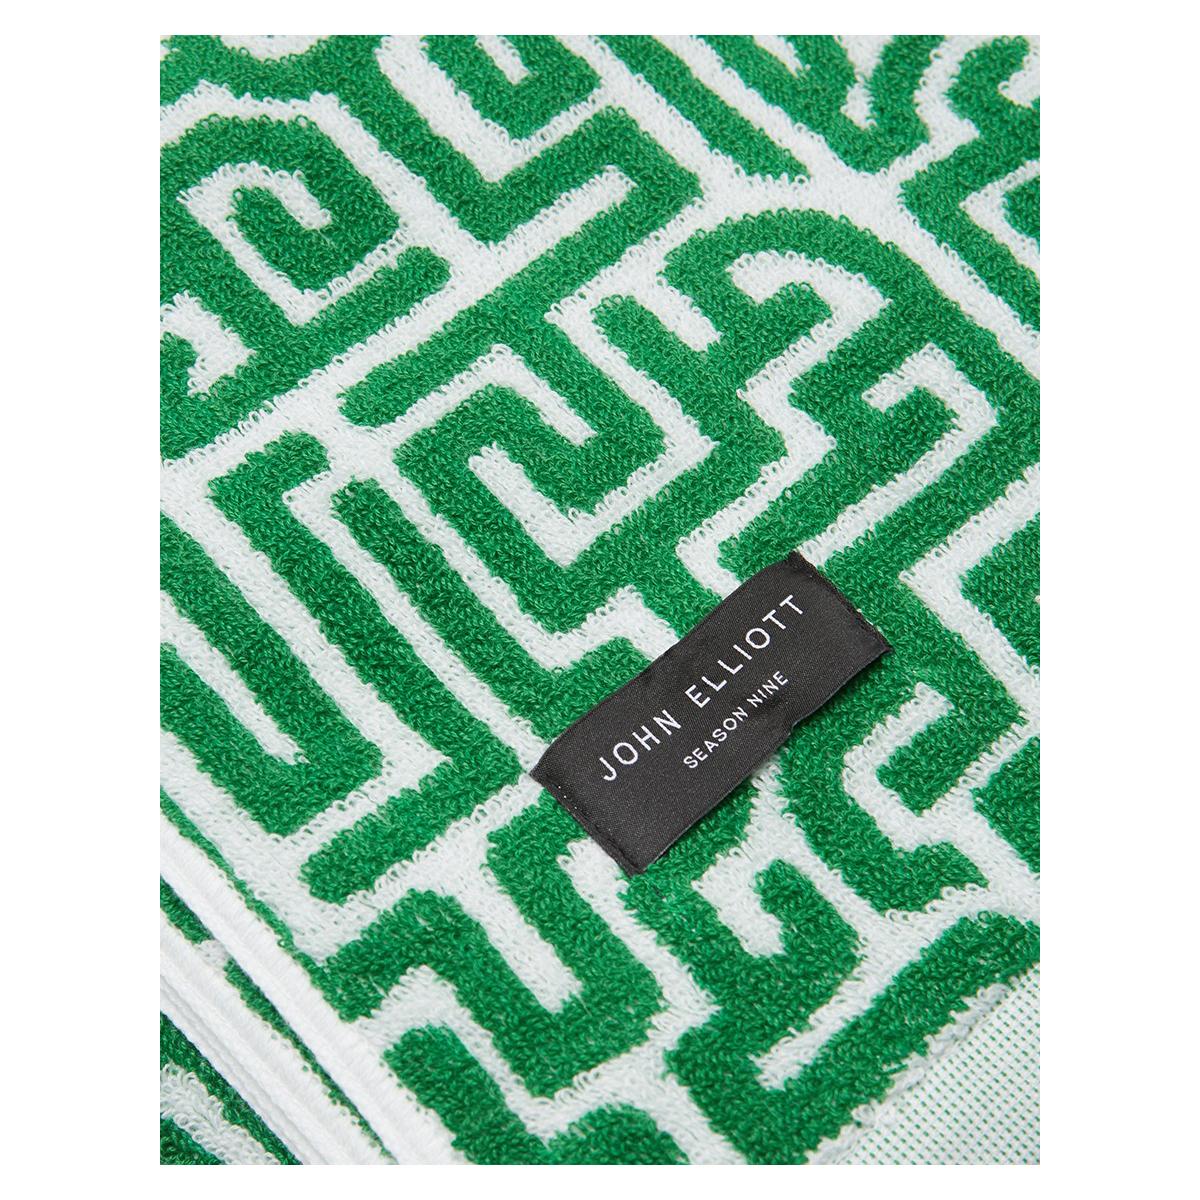 JOHN ELLIOTT Moroccan Beach Towel in Green